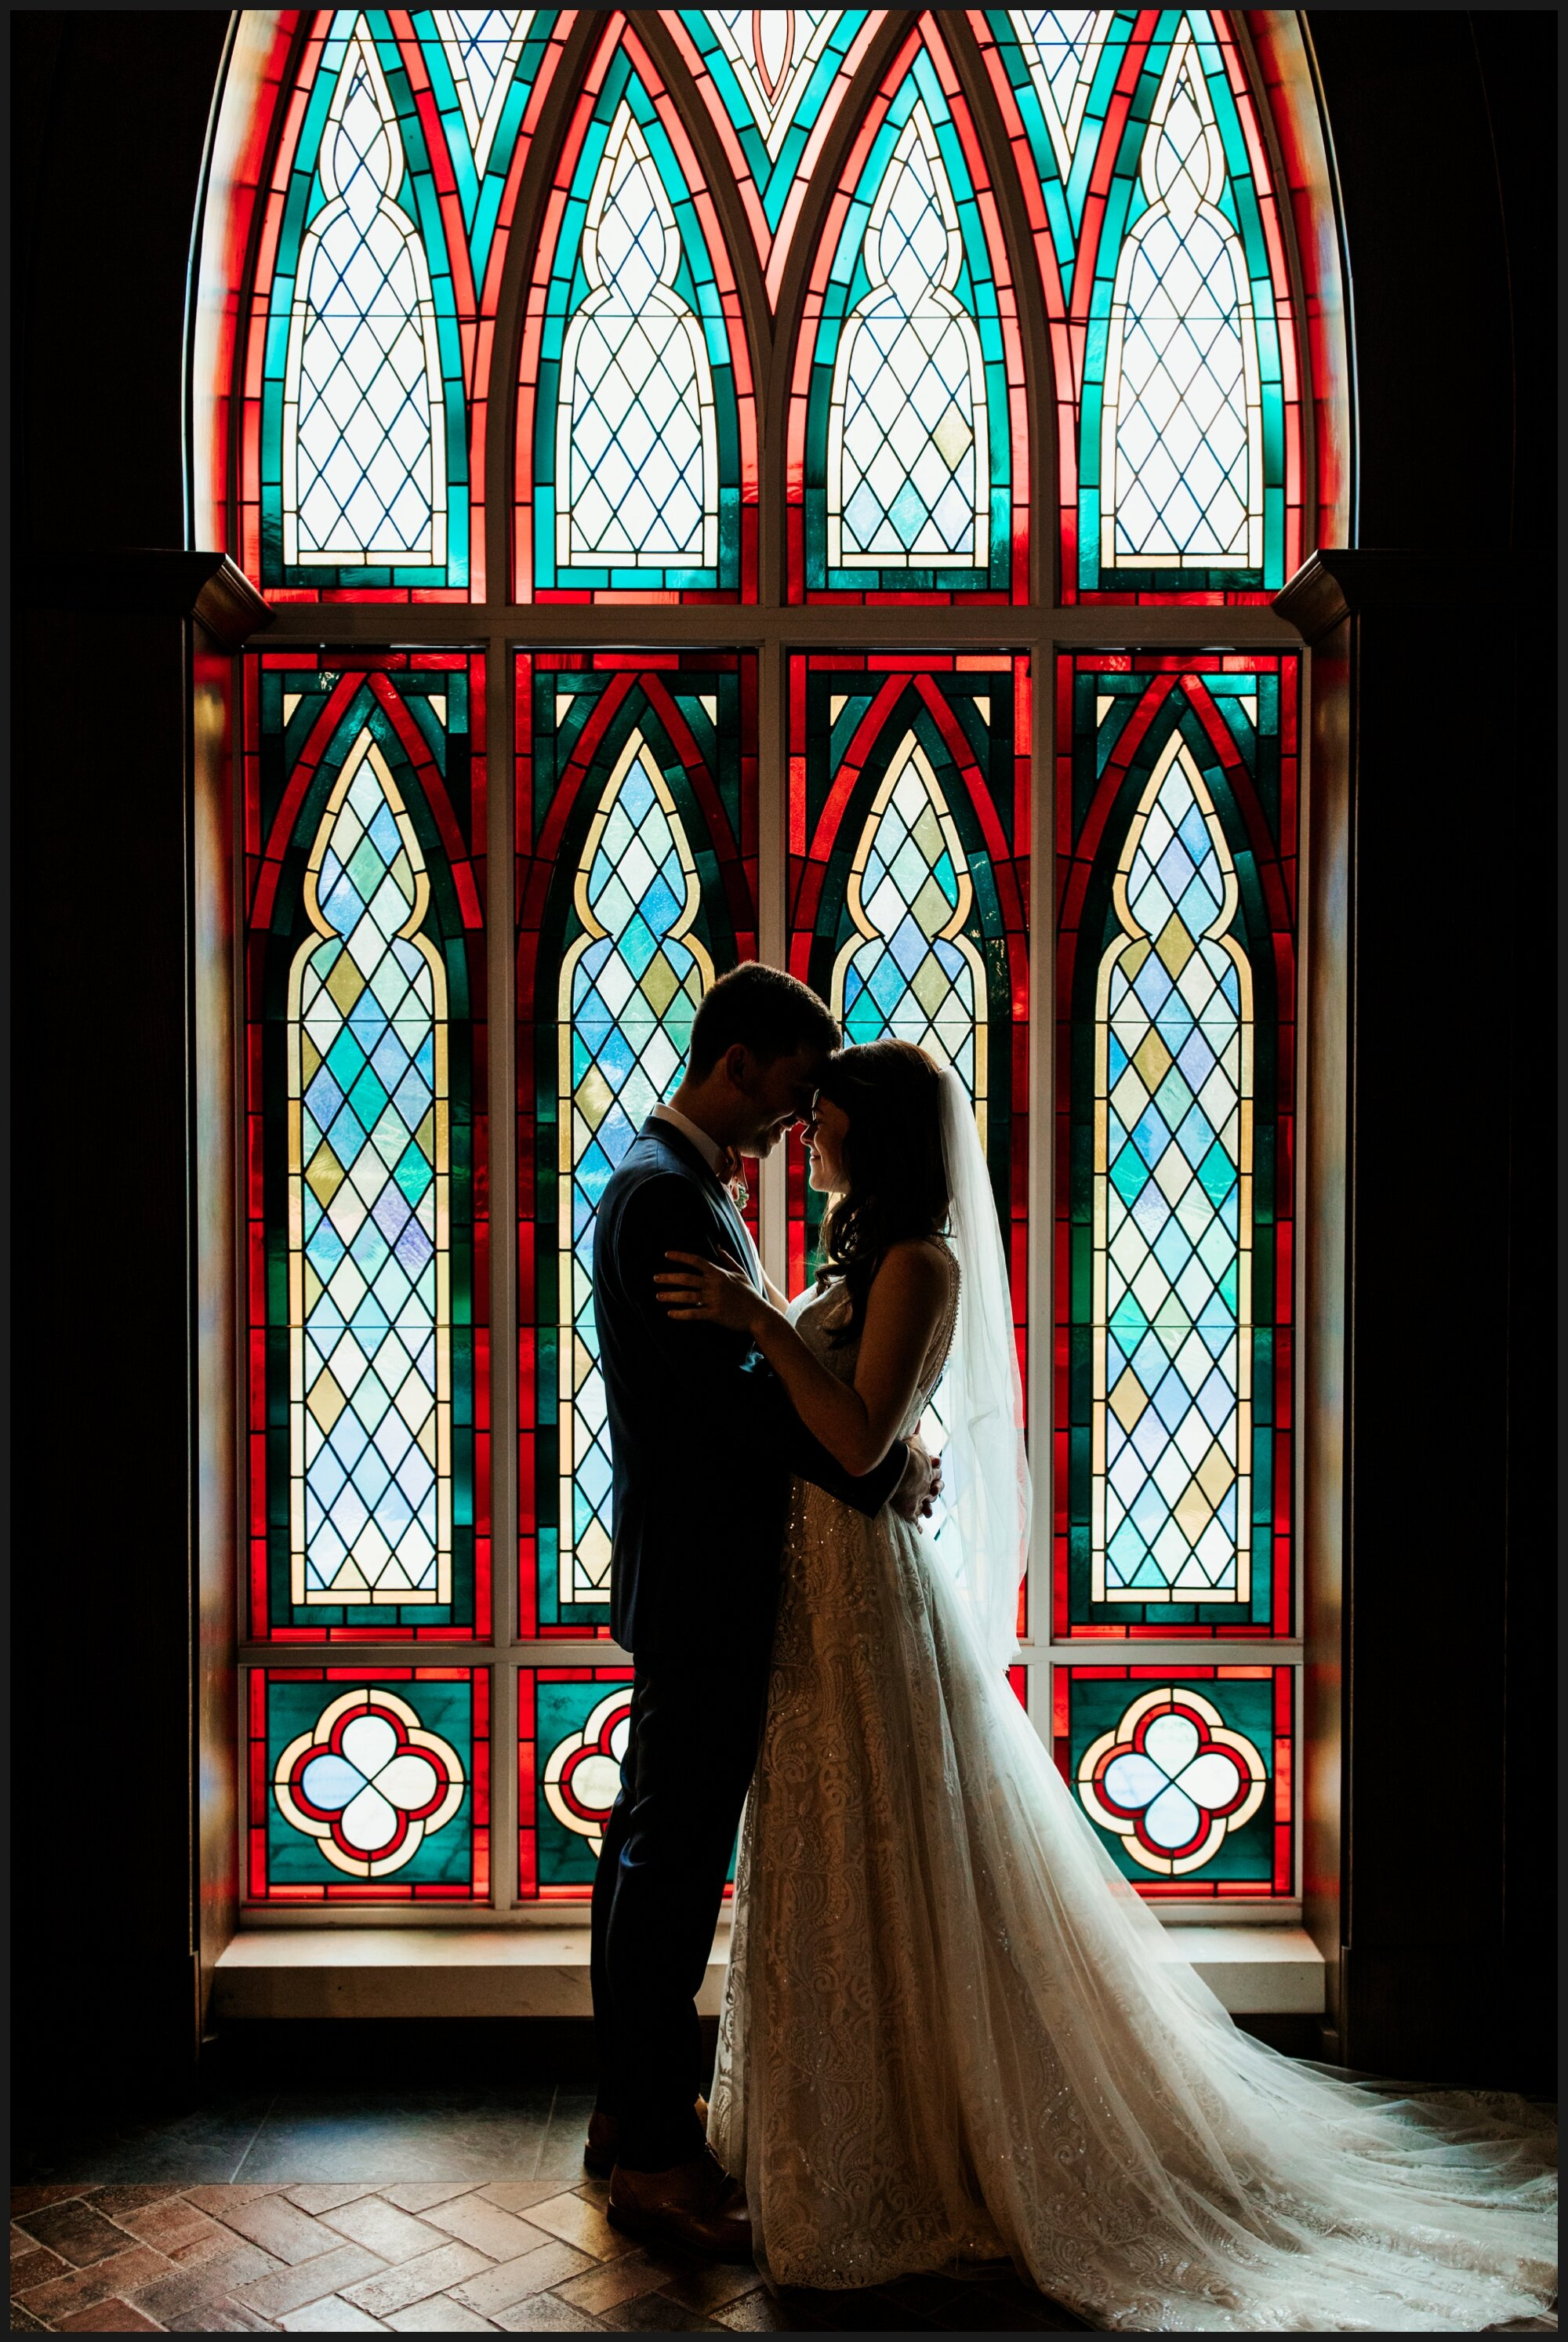 Orlando-Wedding-Photographer-destination-wedding-photographer-florida-wedding-photographer-hawaii-wedding-photographer_0683.jpg